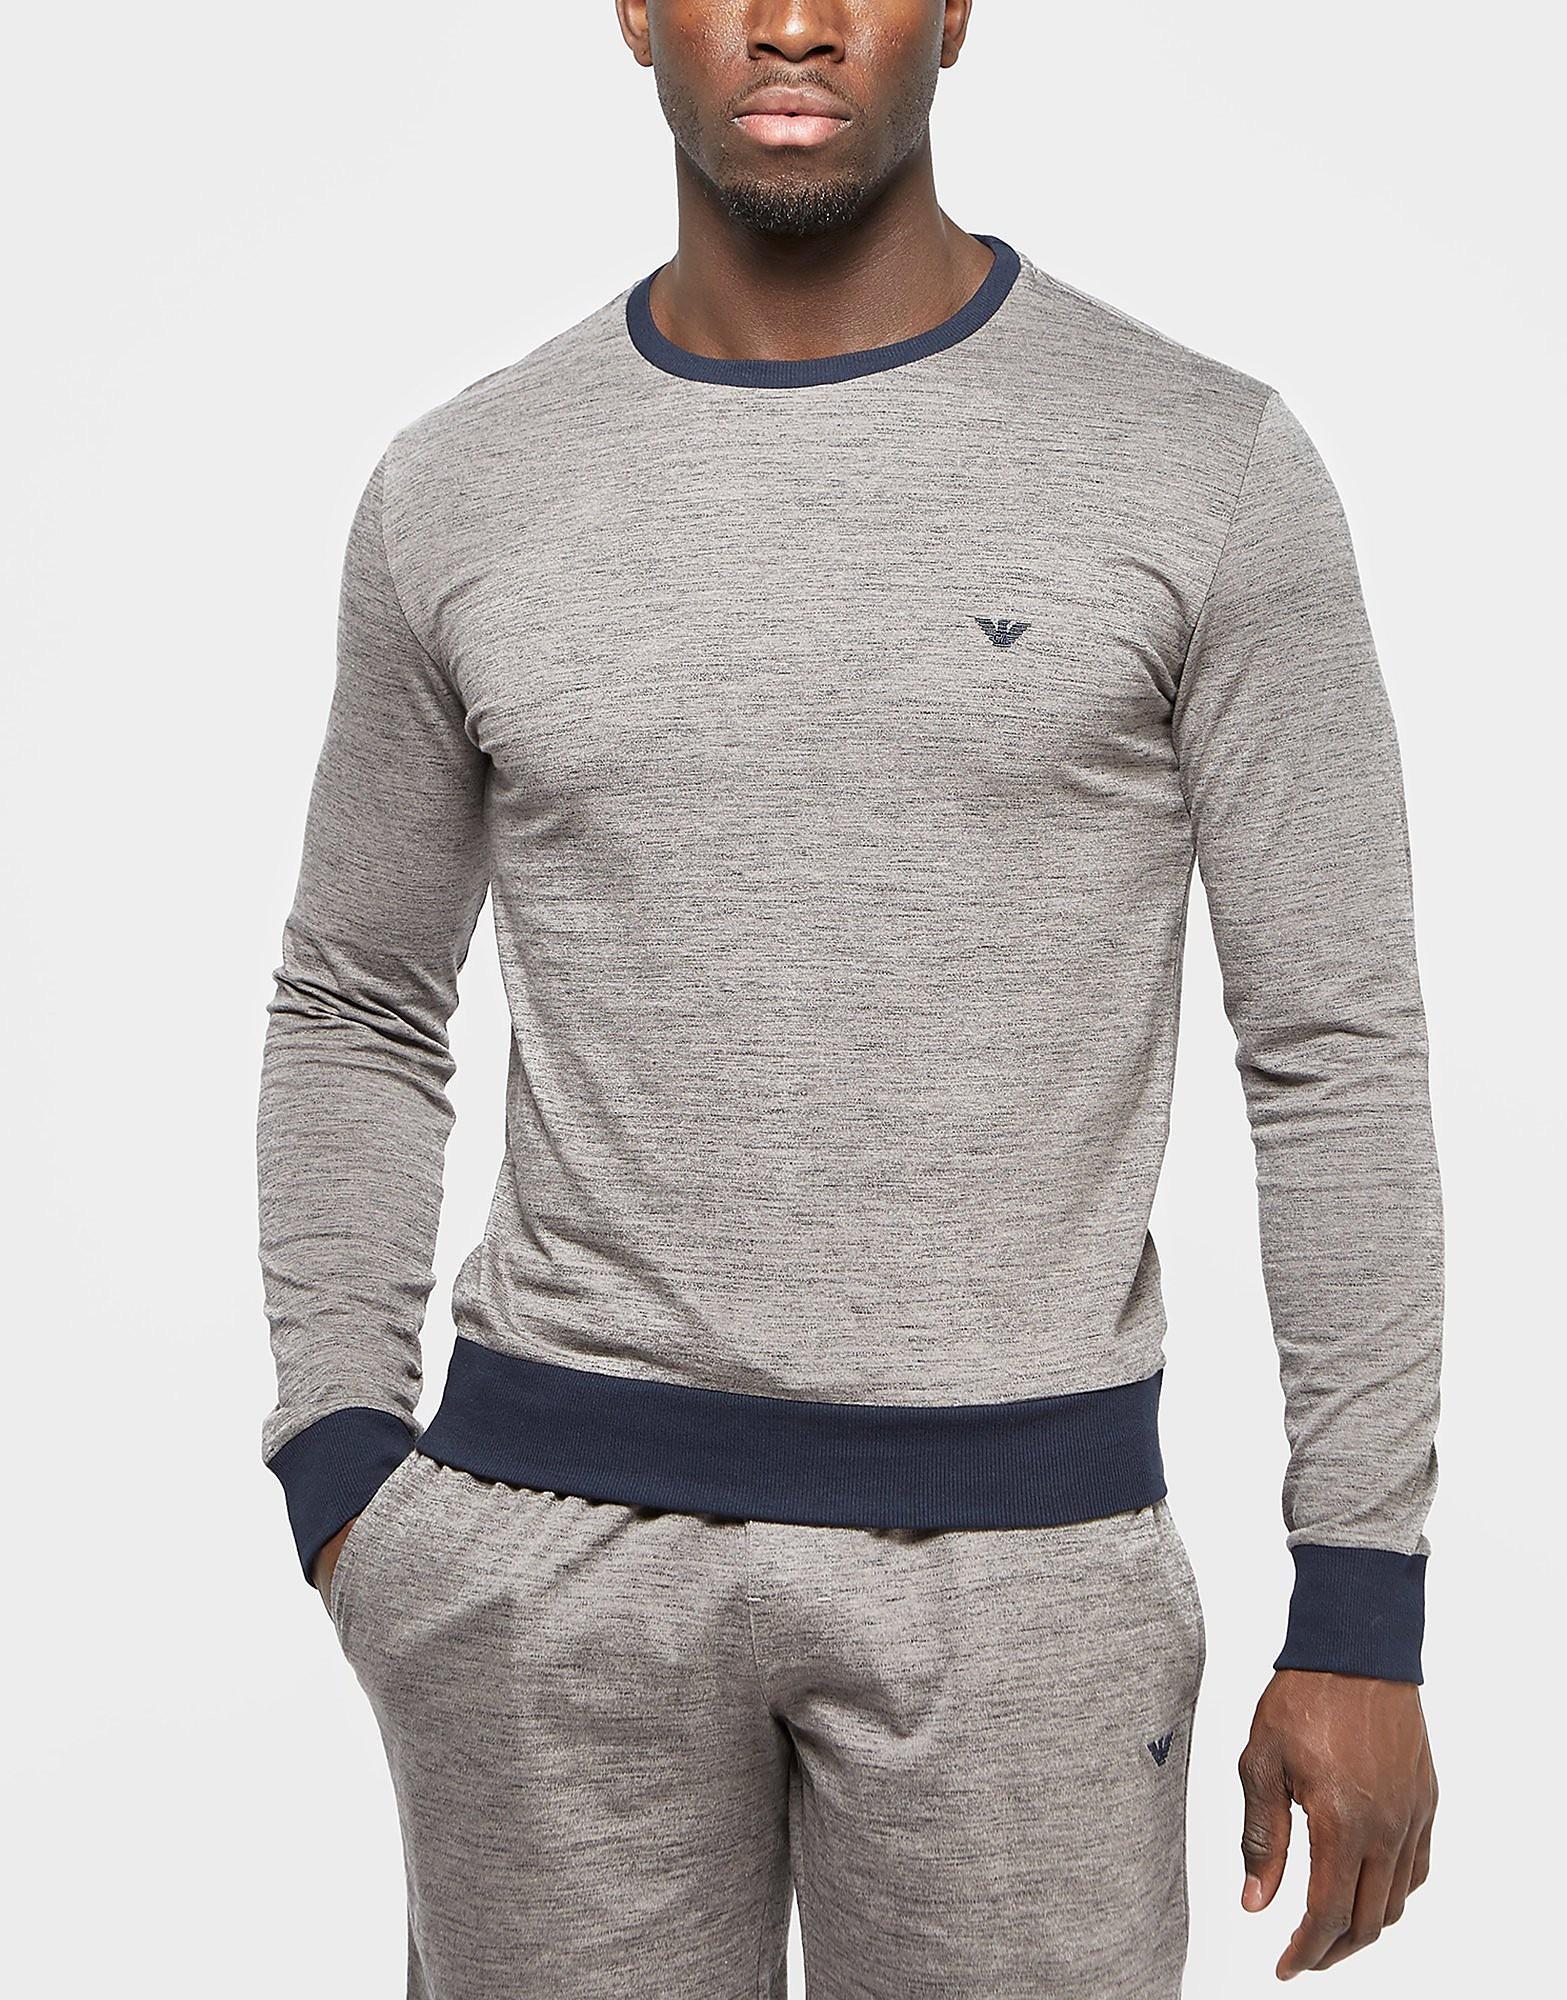 Emporio Armani Crew Sweatshirt